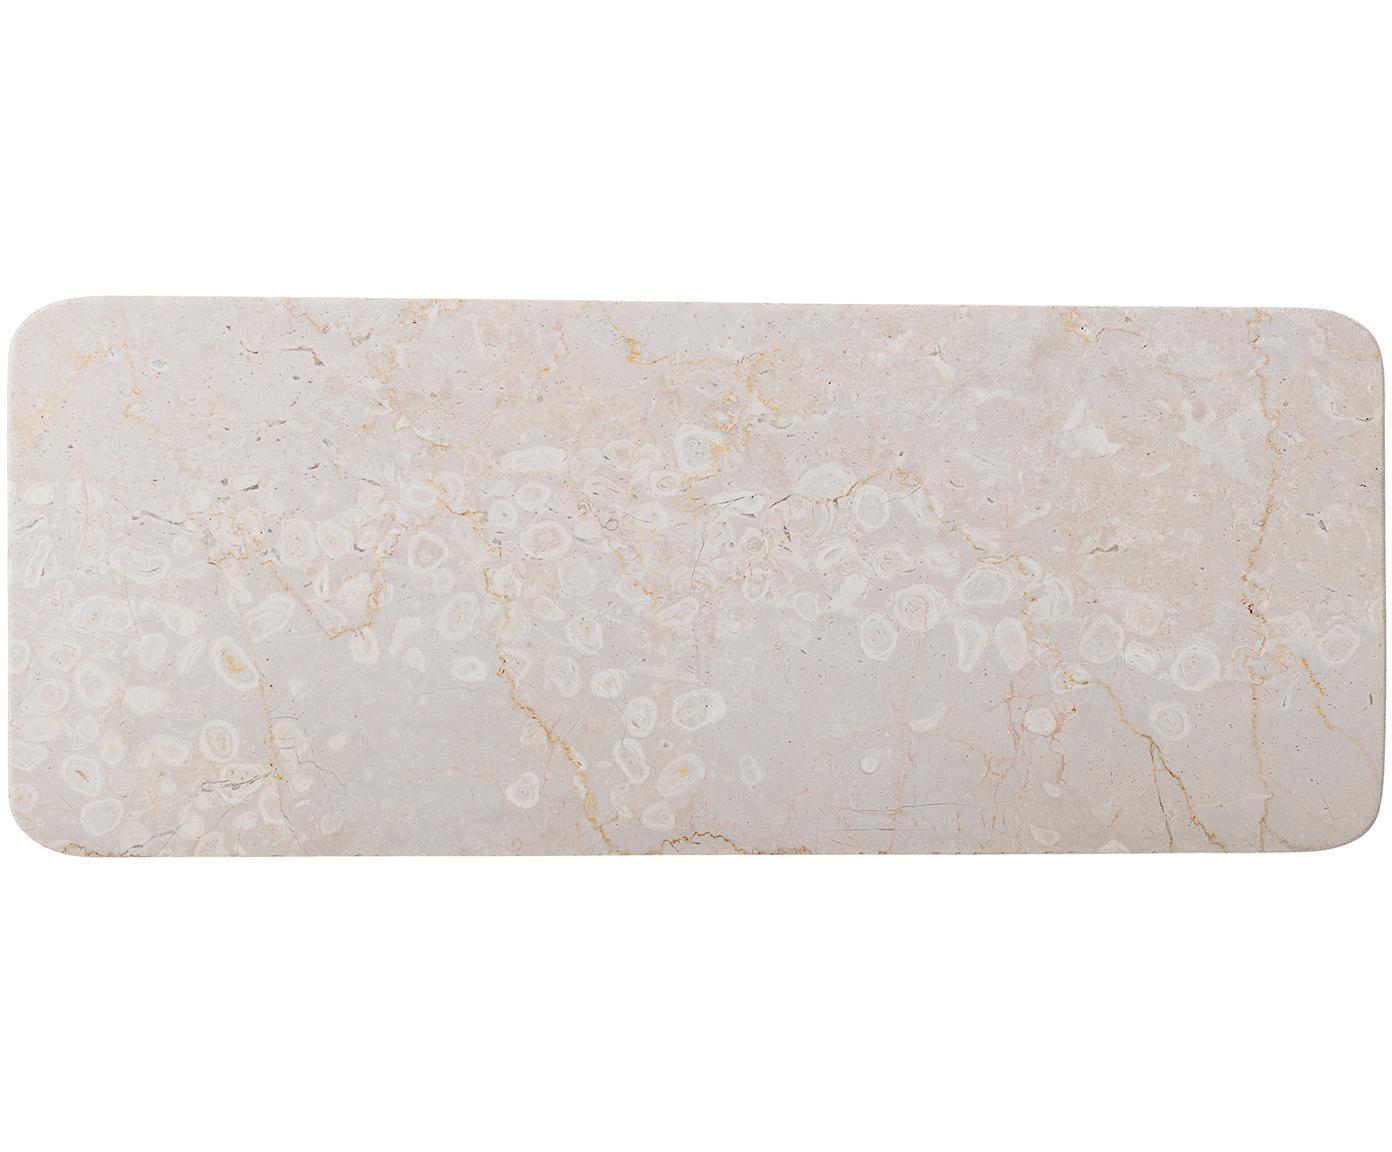 Marmer serveerplateau Maya, Marmer, Beige, L 38 x H 3 cm